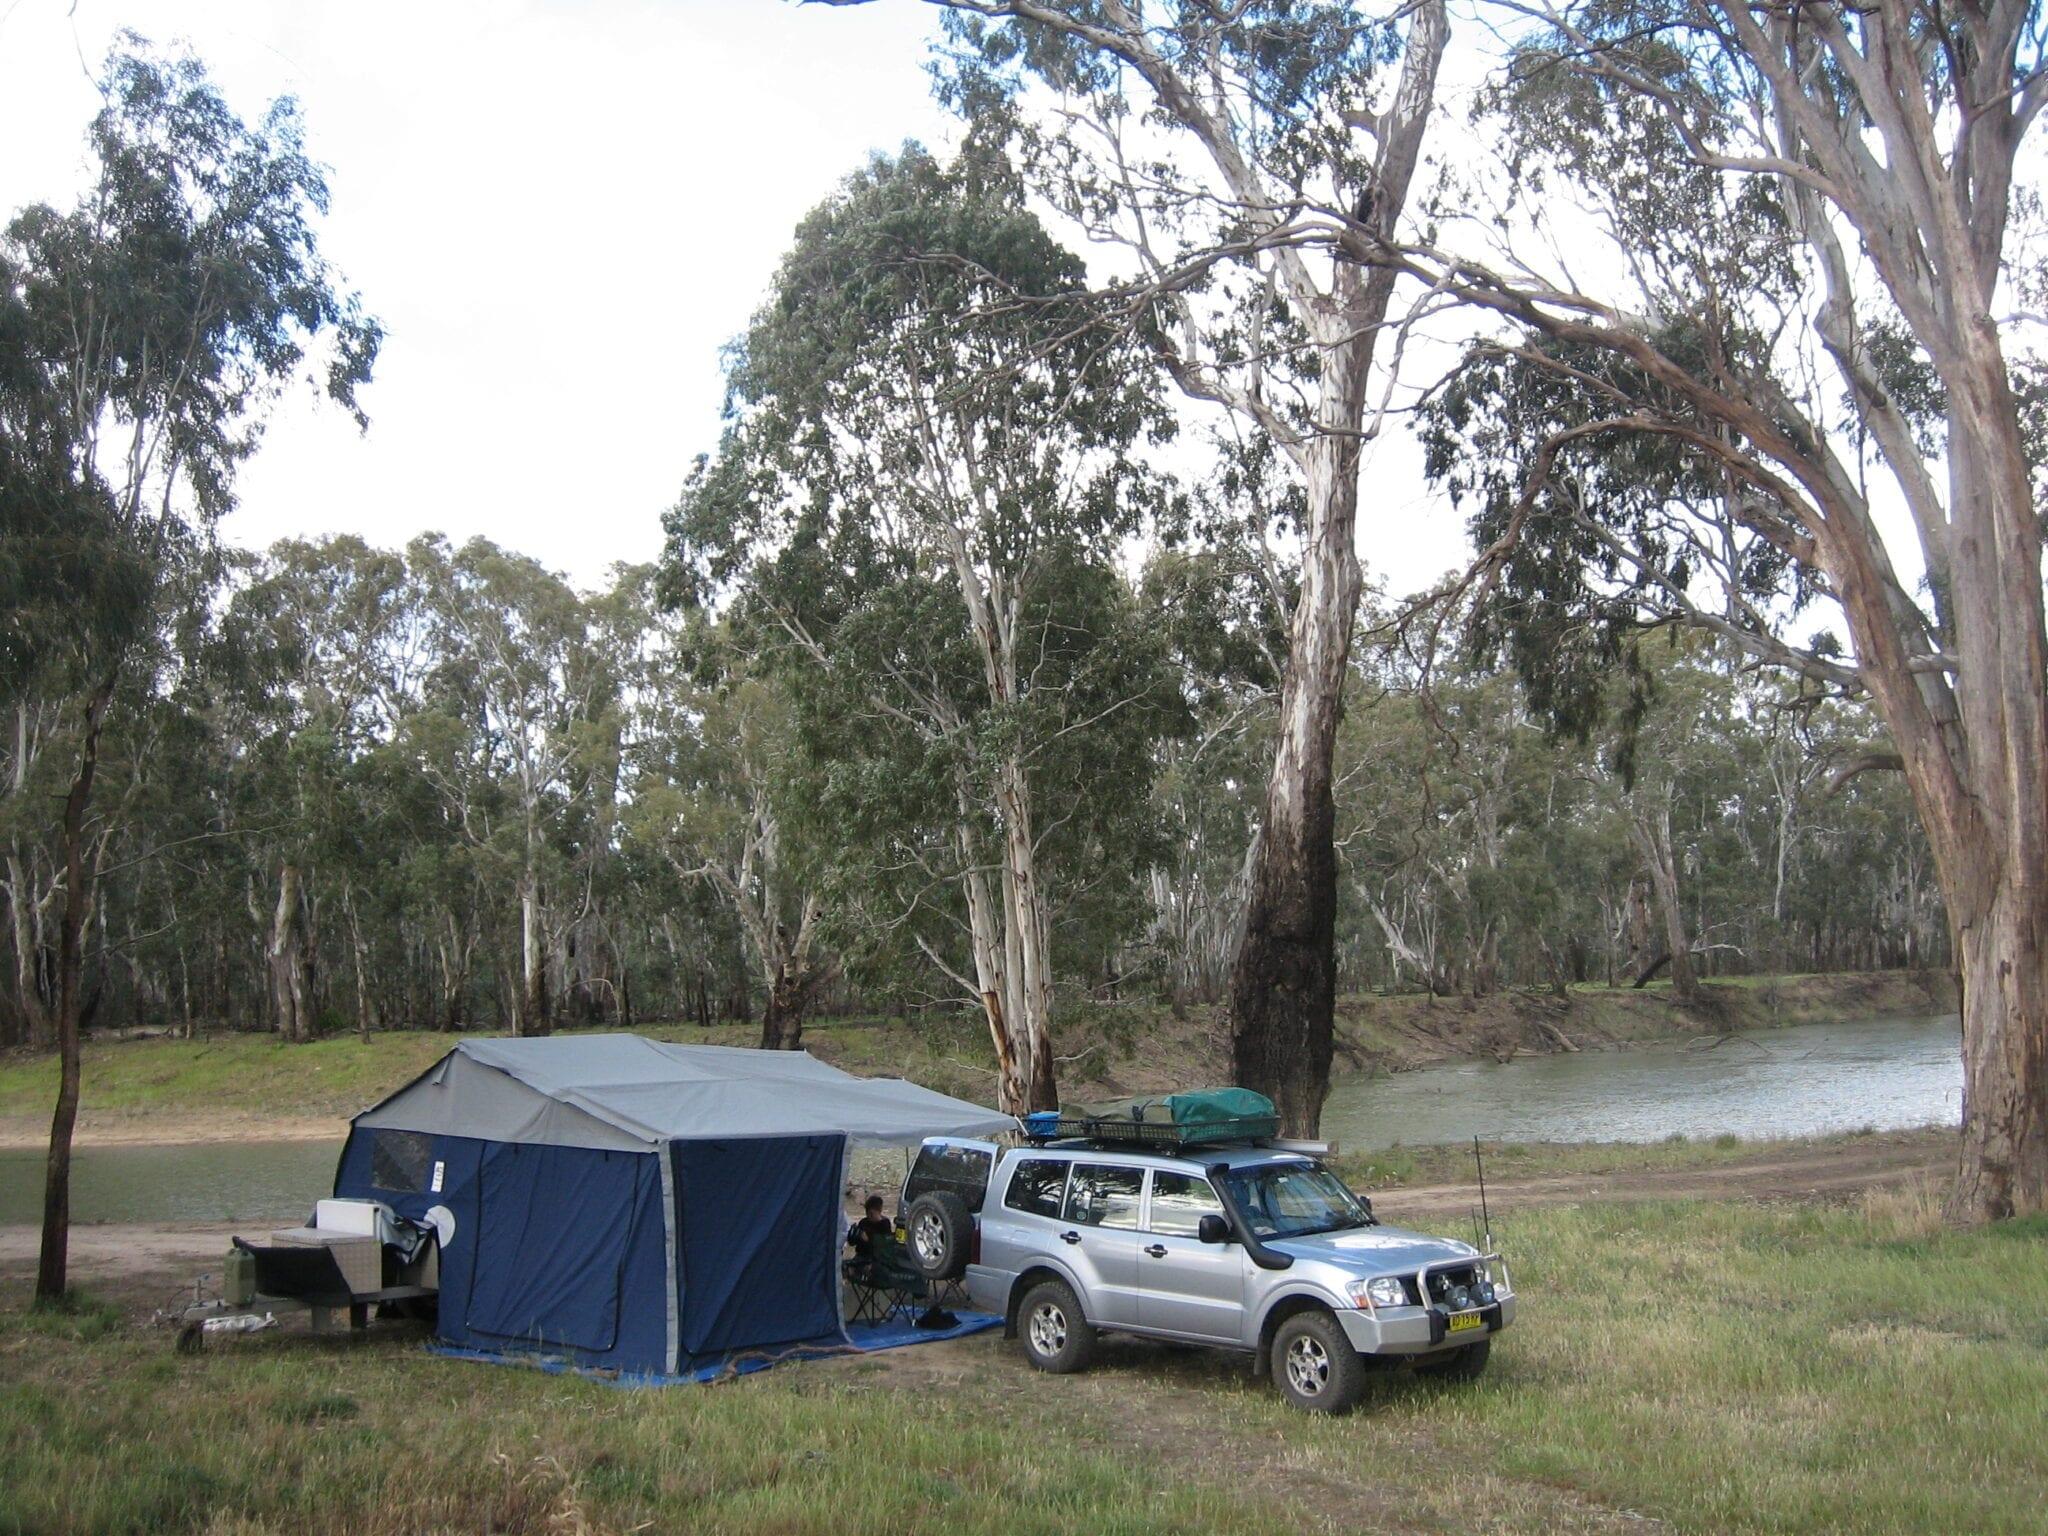 Camping Birdcage Reserve Murrumbidgee River New South Wales Australia